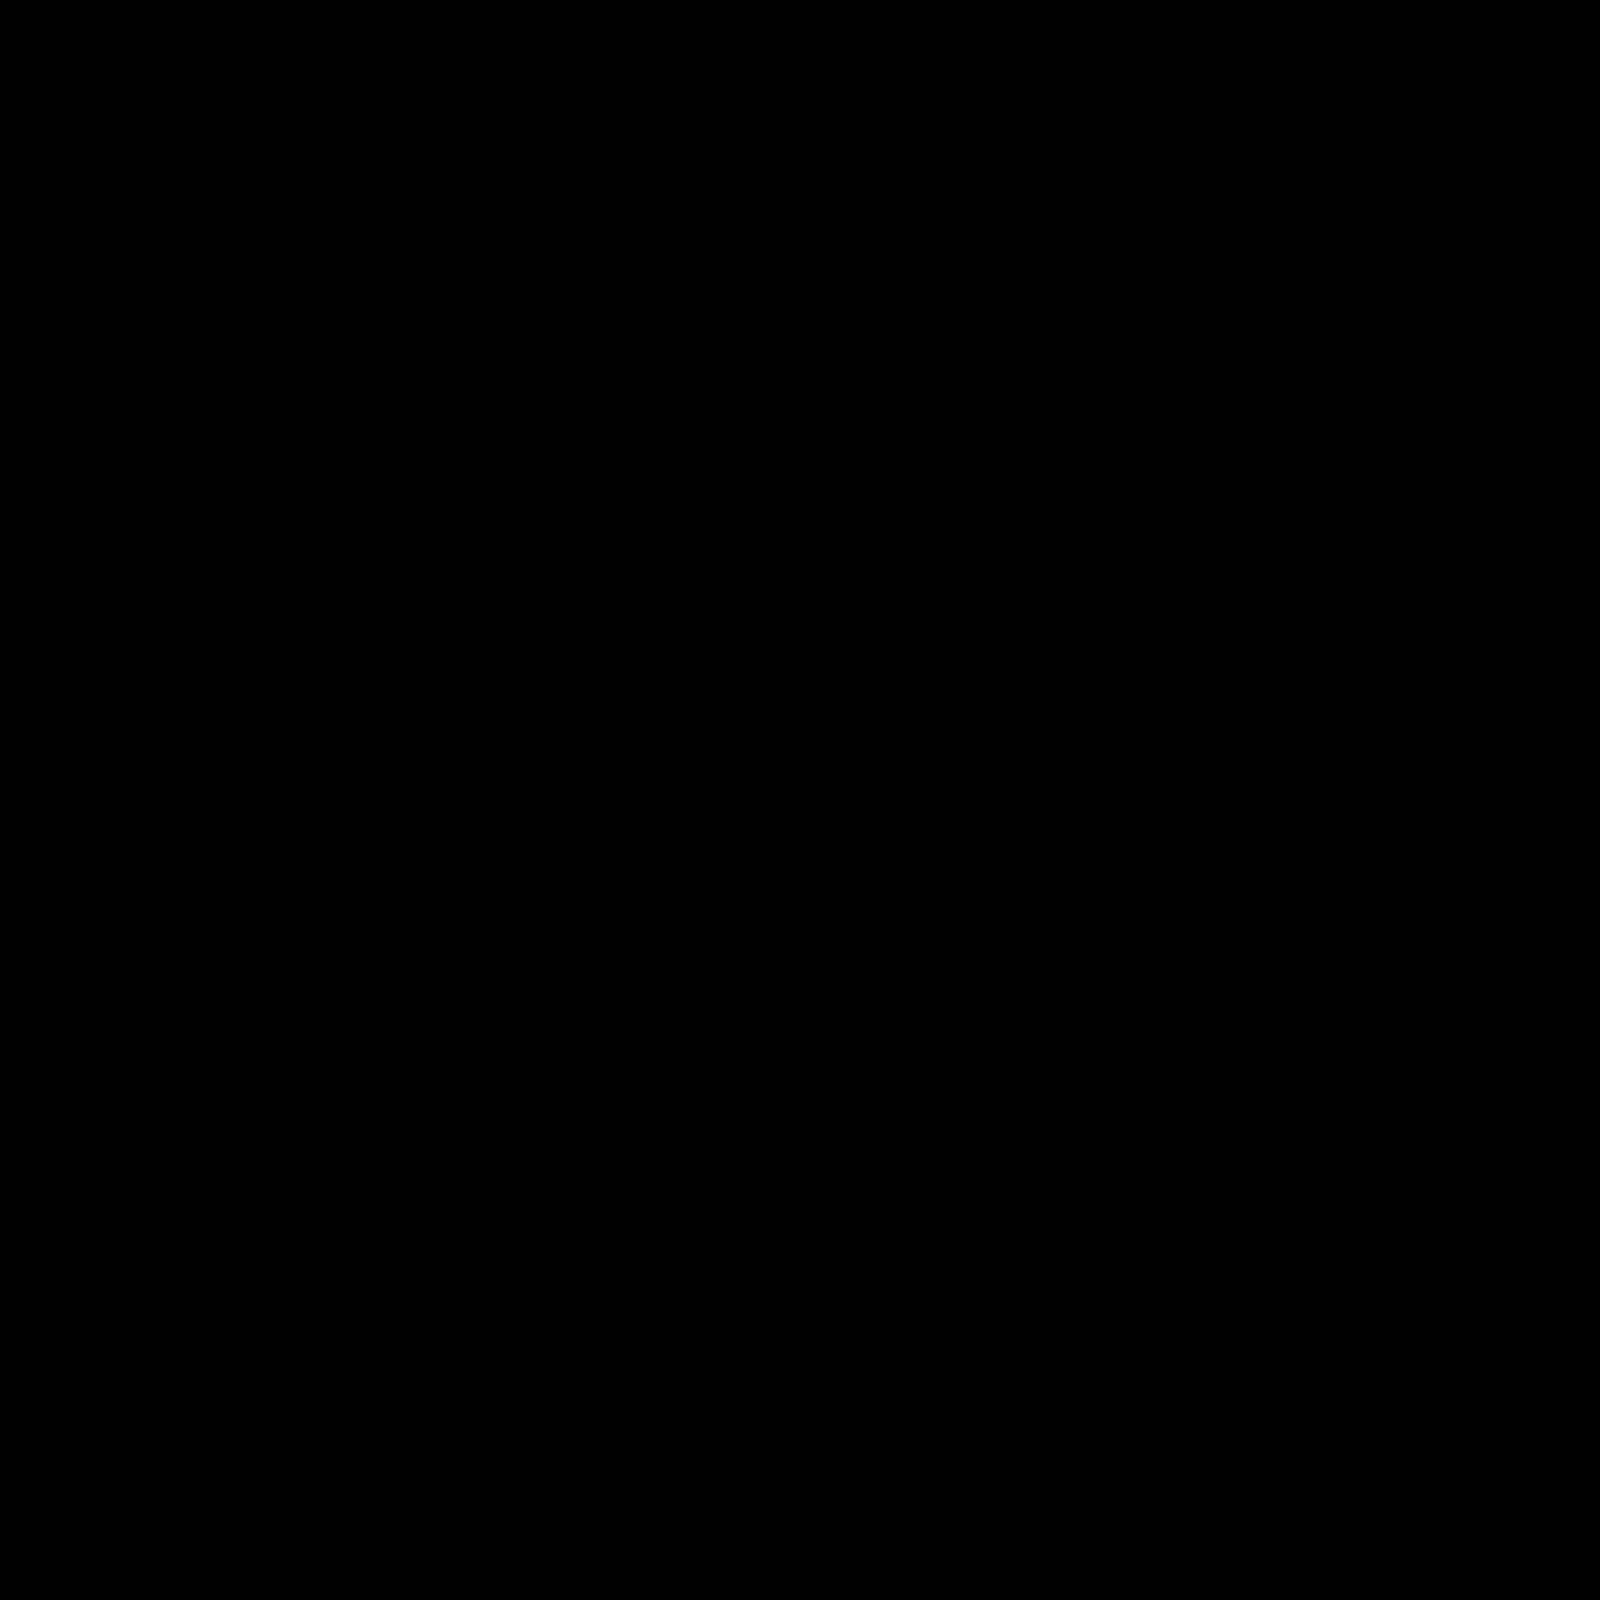 Milestone Filled icon